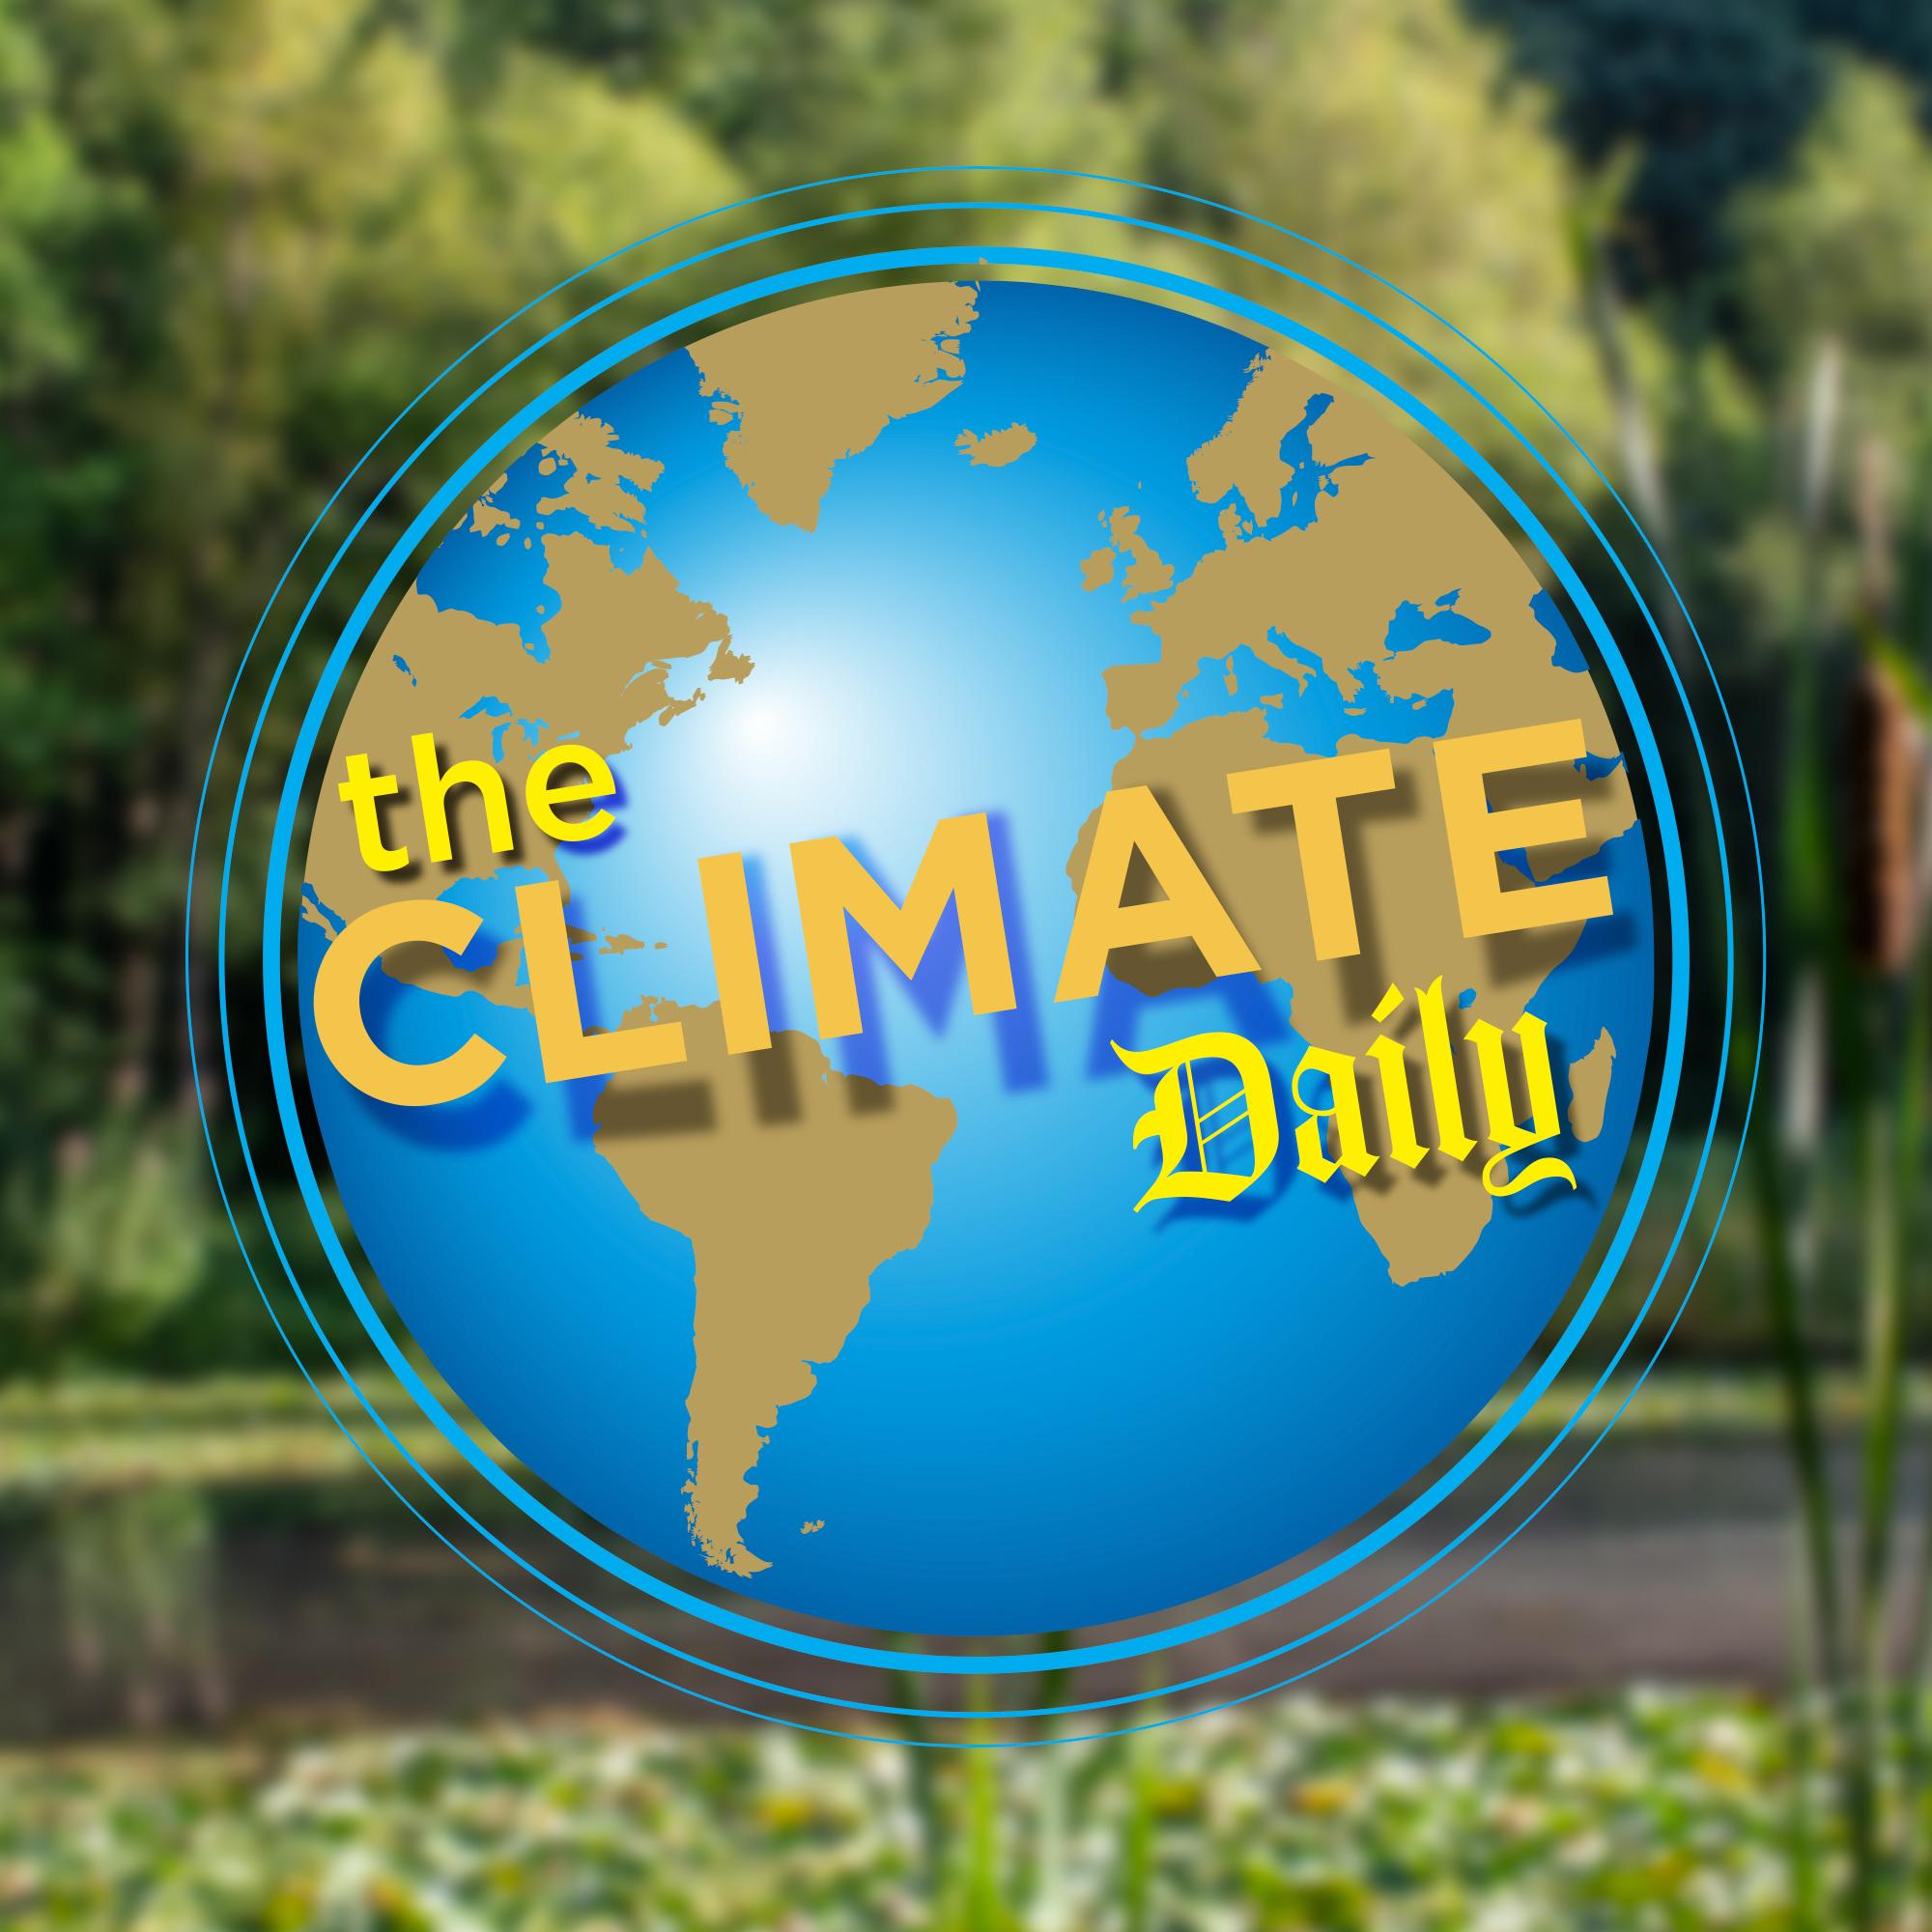 Upper Marlboro, MD Buys First EV,  2021 Maryland Smart Energy Grant Awards, Climate Champion Leonardo Dicaprio Pledges $43 Million to Restore Galapagos Islands